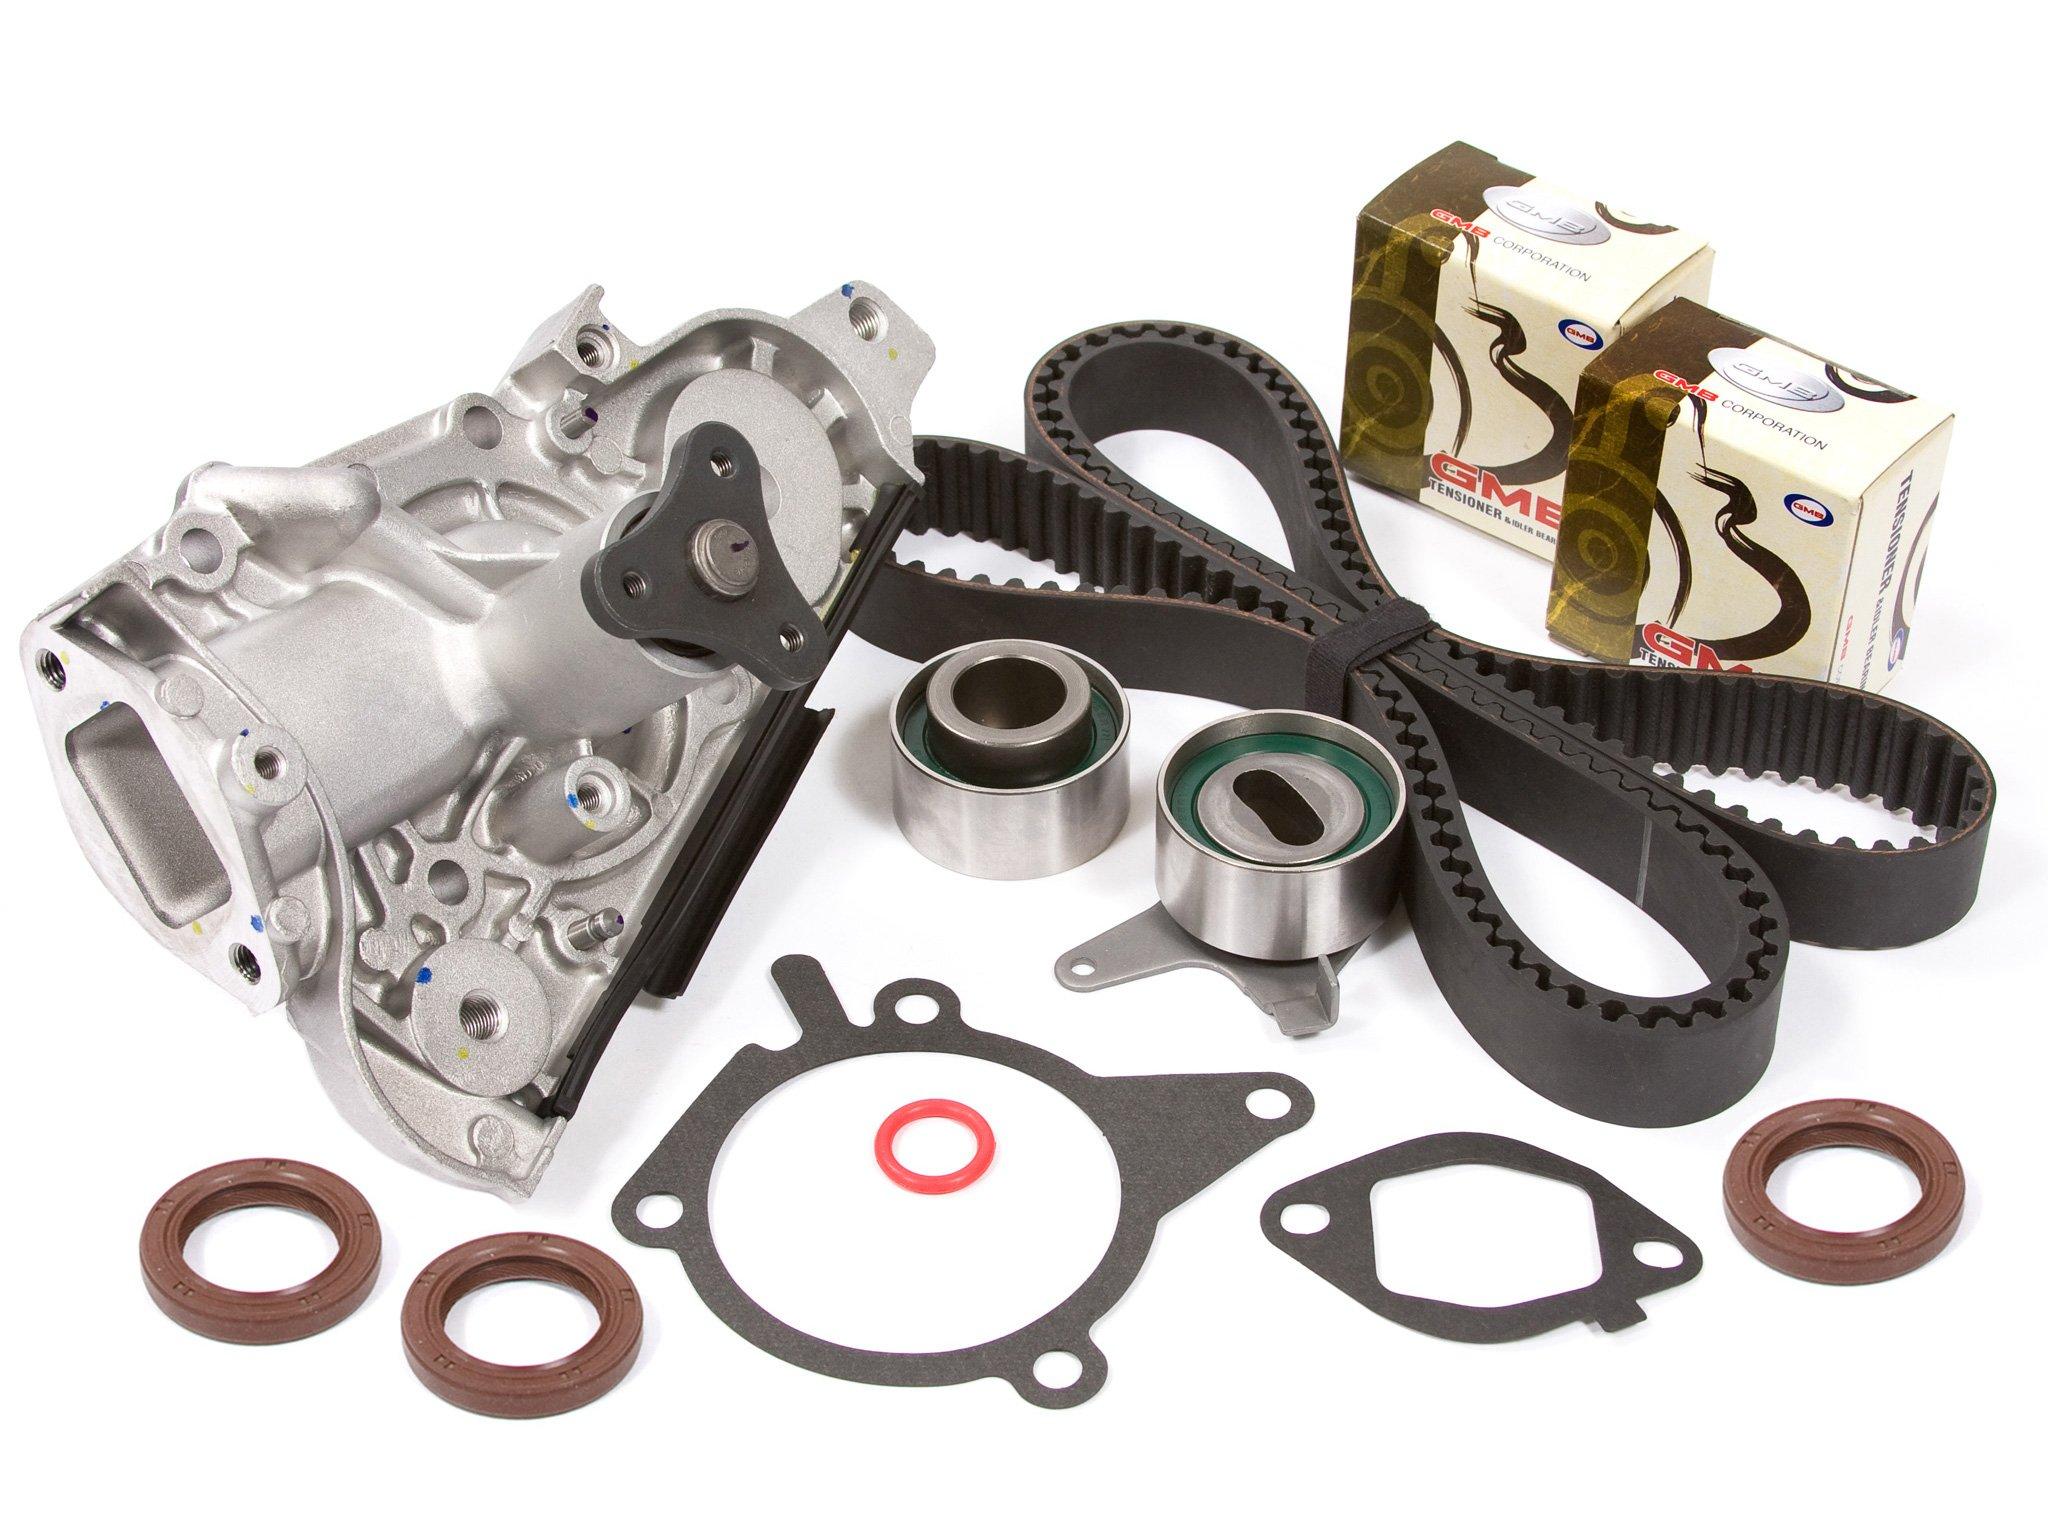 Mazda Protege 16 Parts Timing Belt Kit 05 6 Evergreen Tbk179wpt2 94 Miata Mx 3 Kia Sephia 18 Dohc